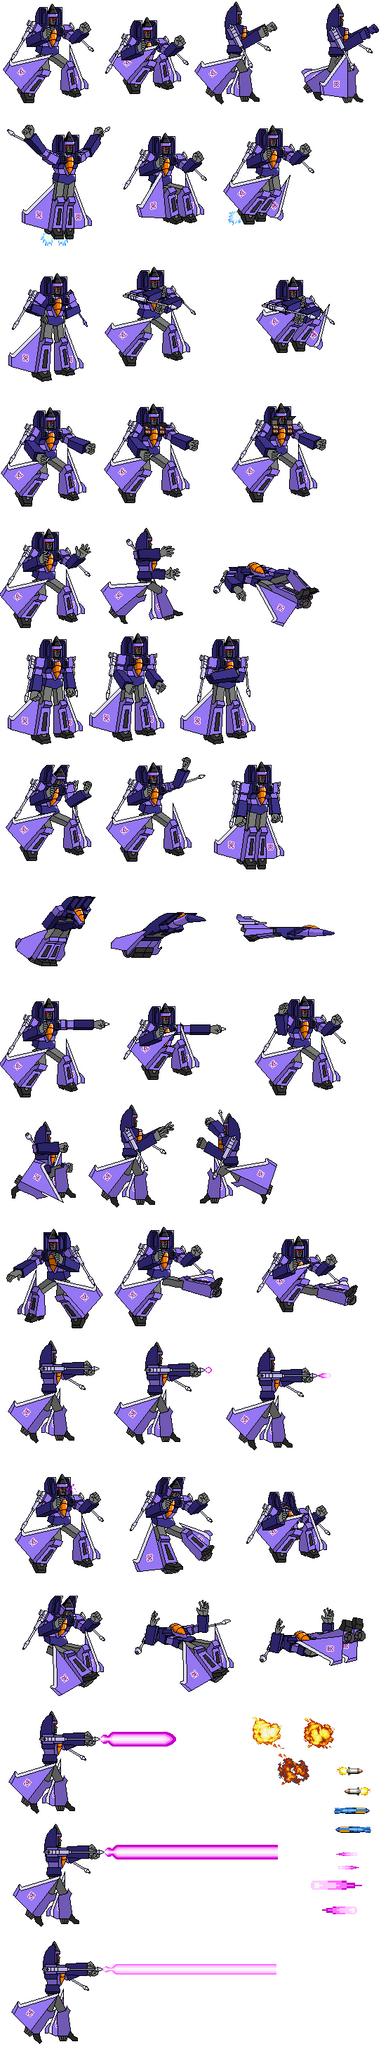 Transformers Devastation Seekers A by Skyscream1 by skyscream1